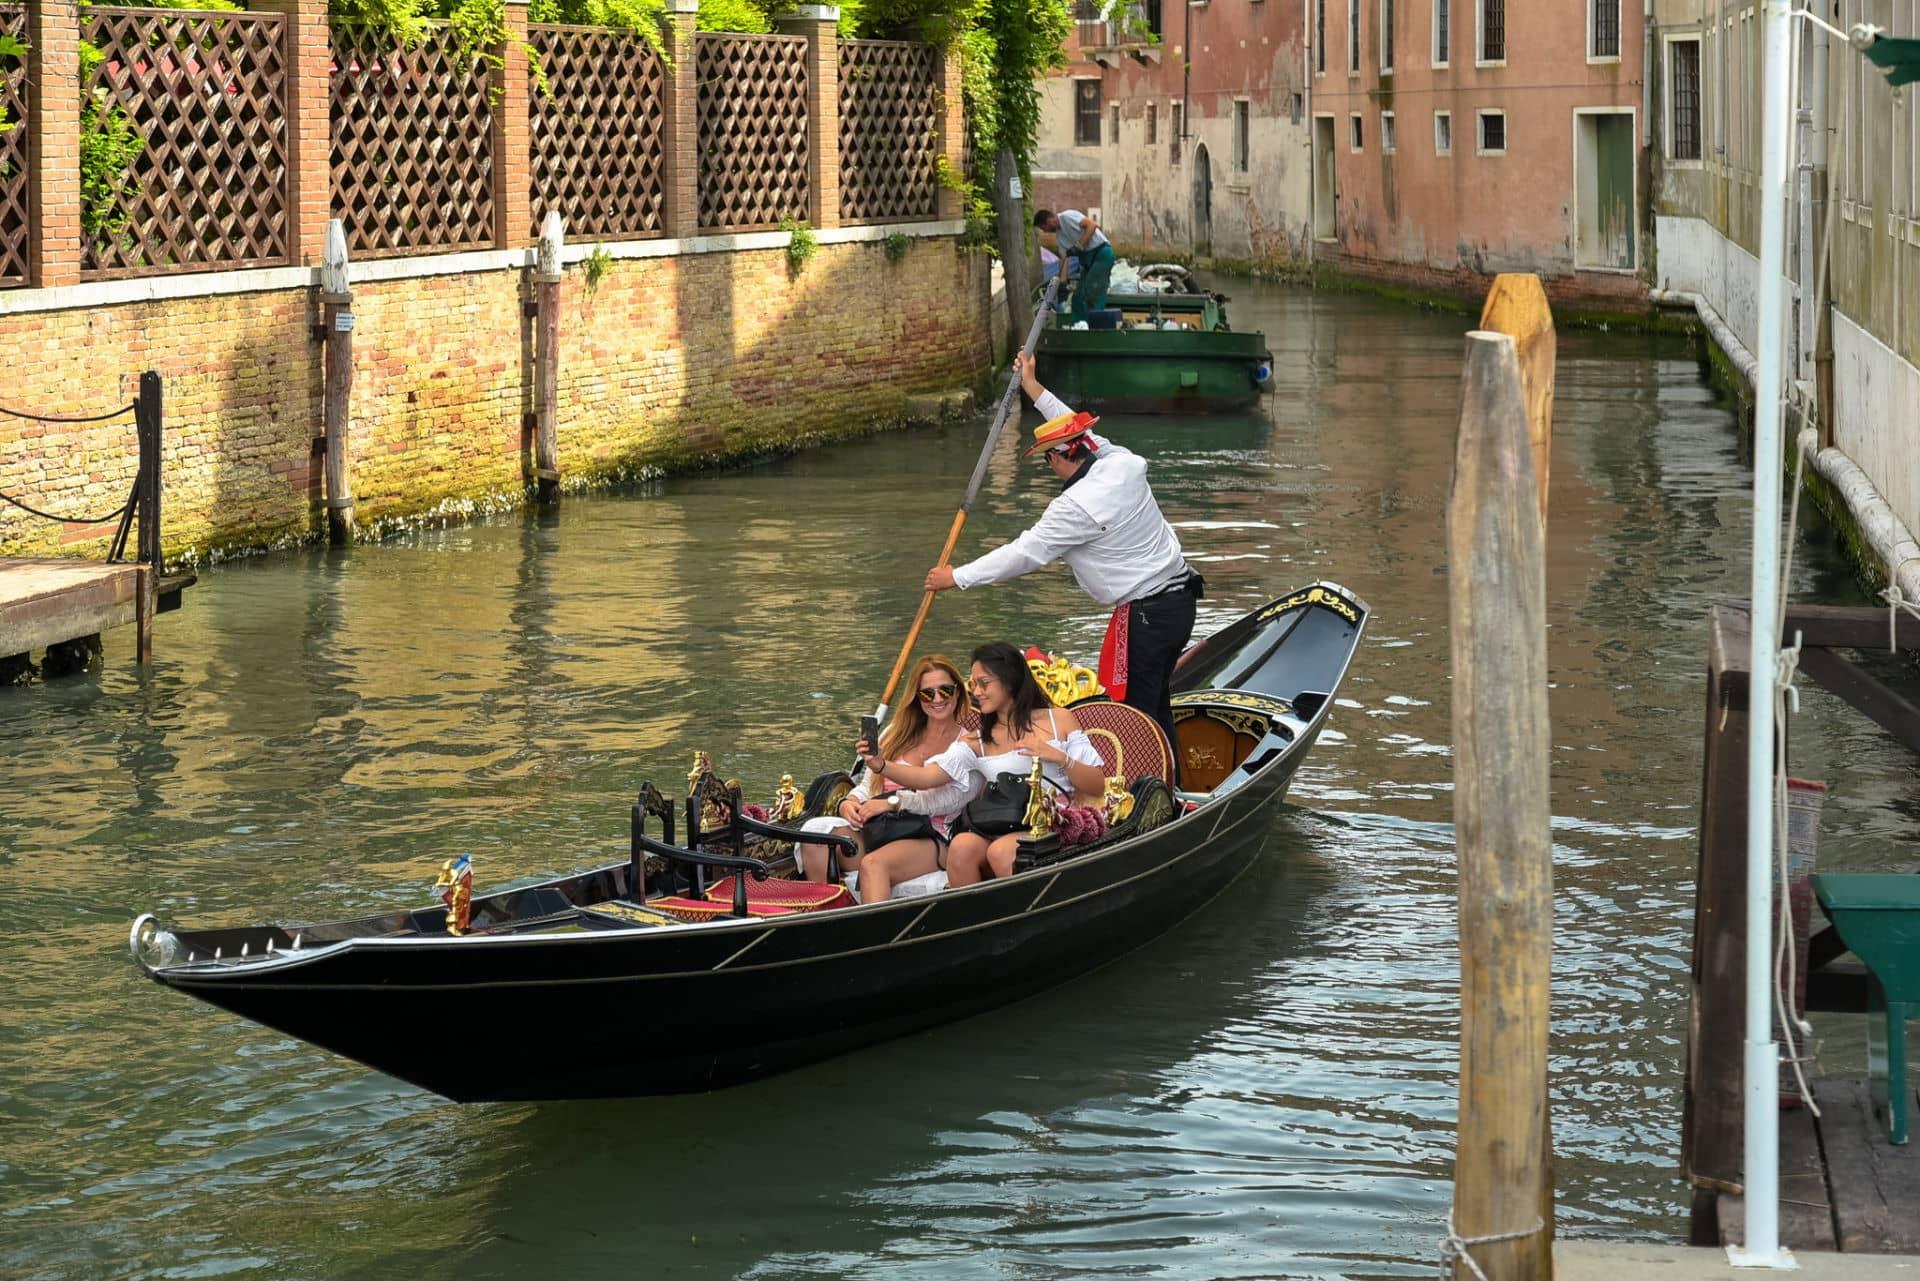 Turiste in Gondola a Venezia